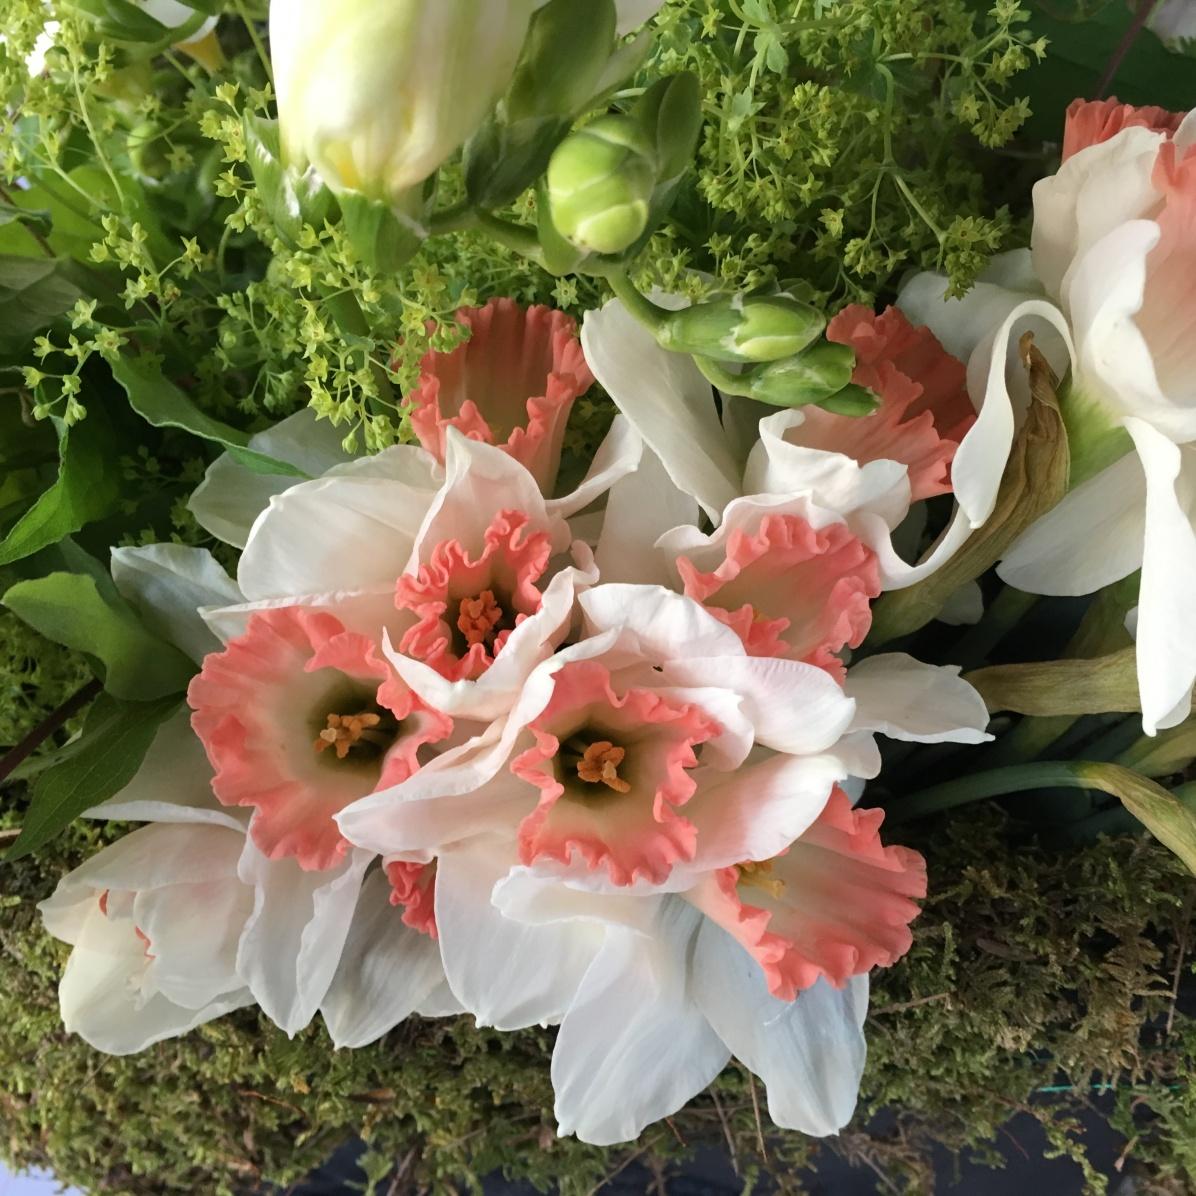 floral-cindye-spring-dinner-party-2